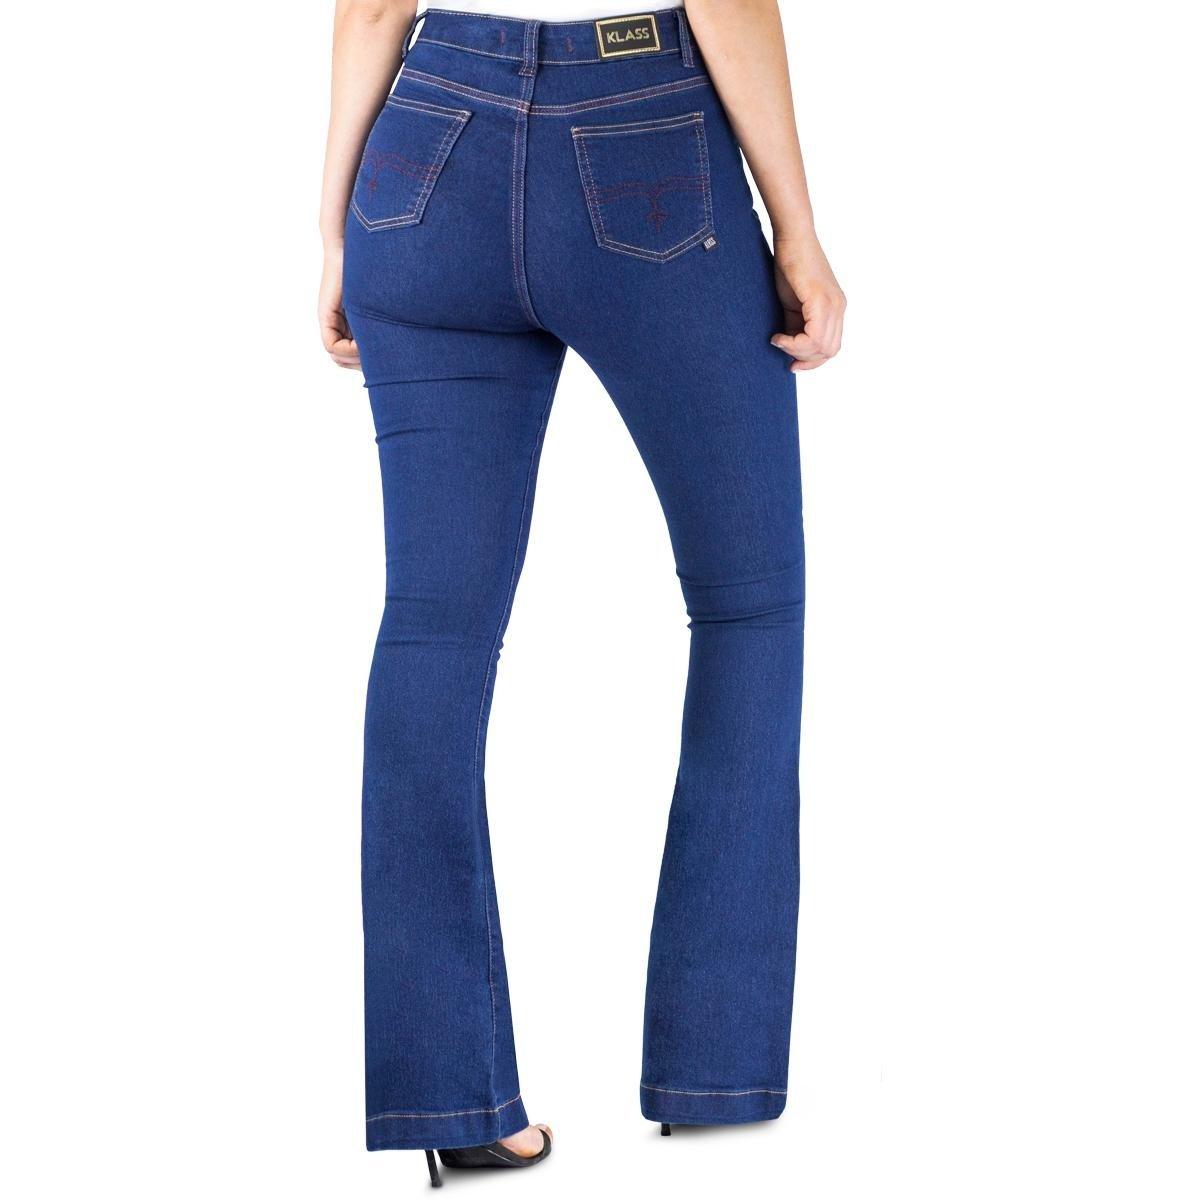 Calça Klass Escuro Azul Jeans Calça Feminina Klass Flare Amaciada 5wUpvq